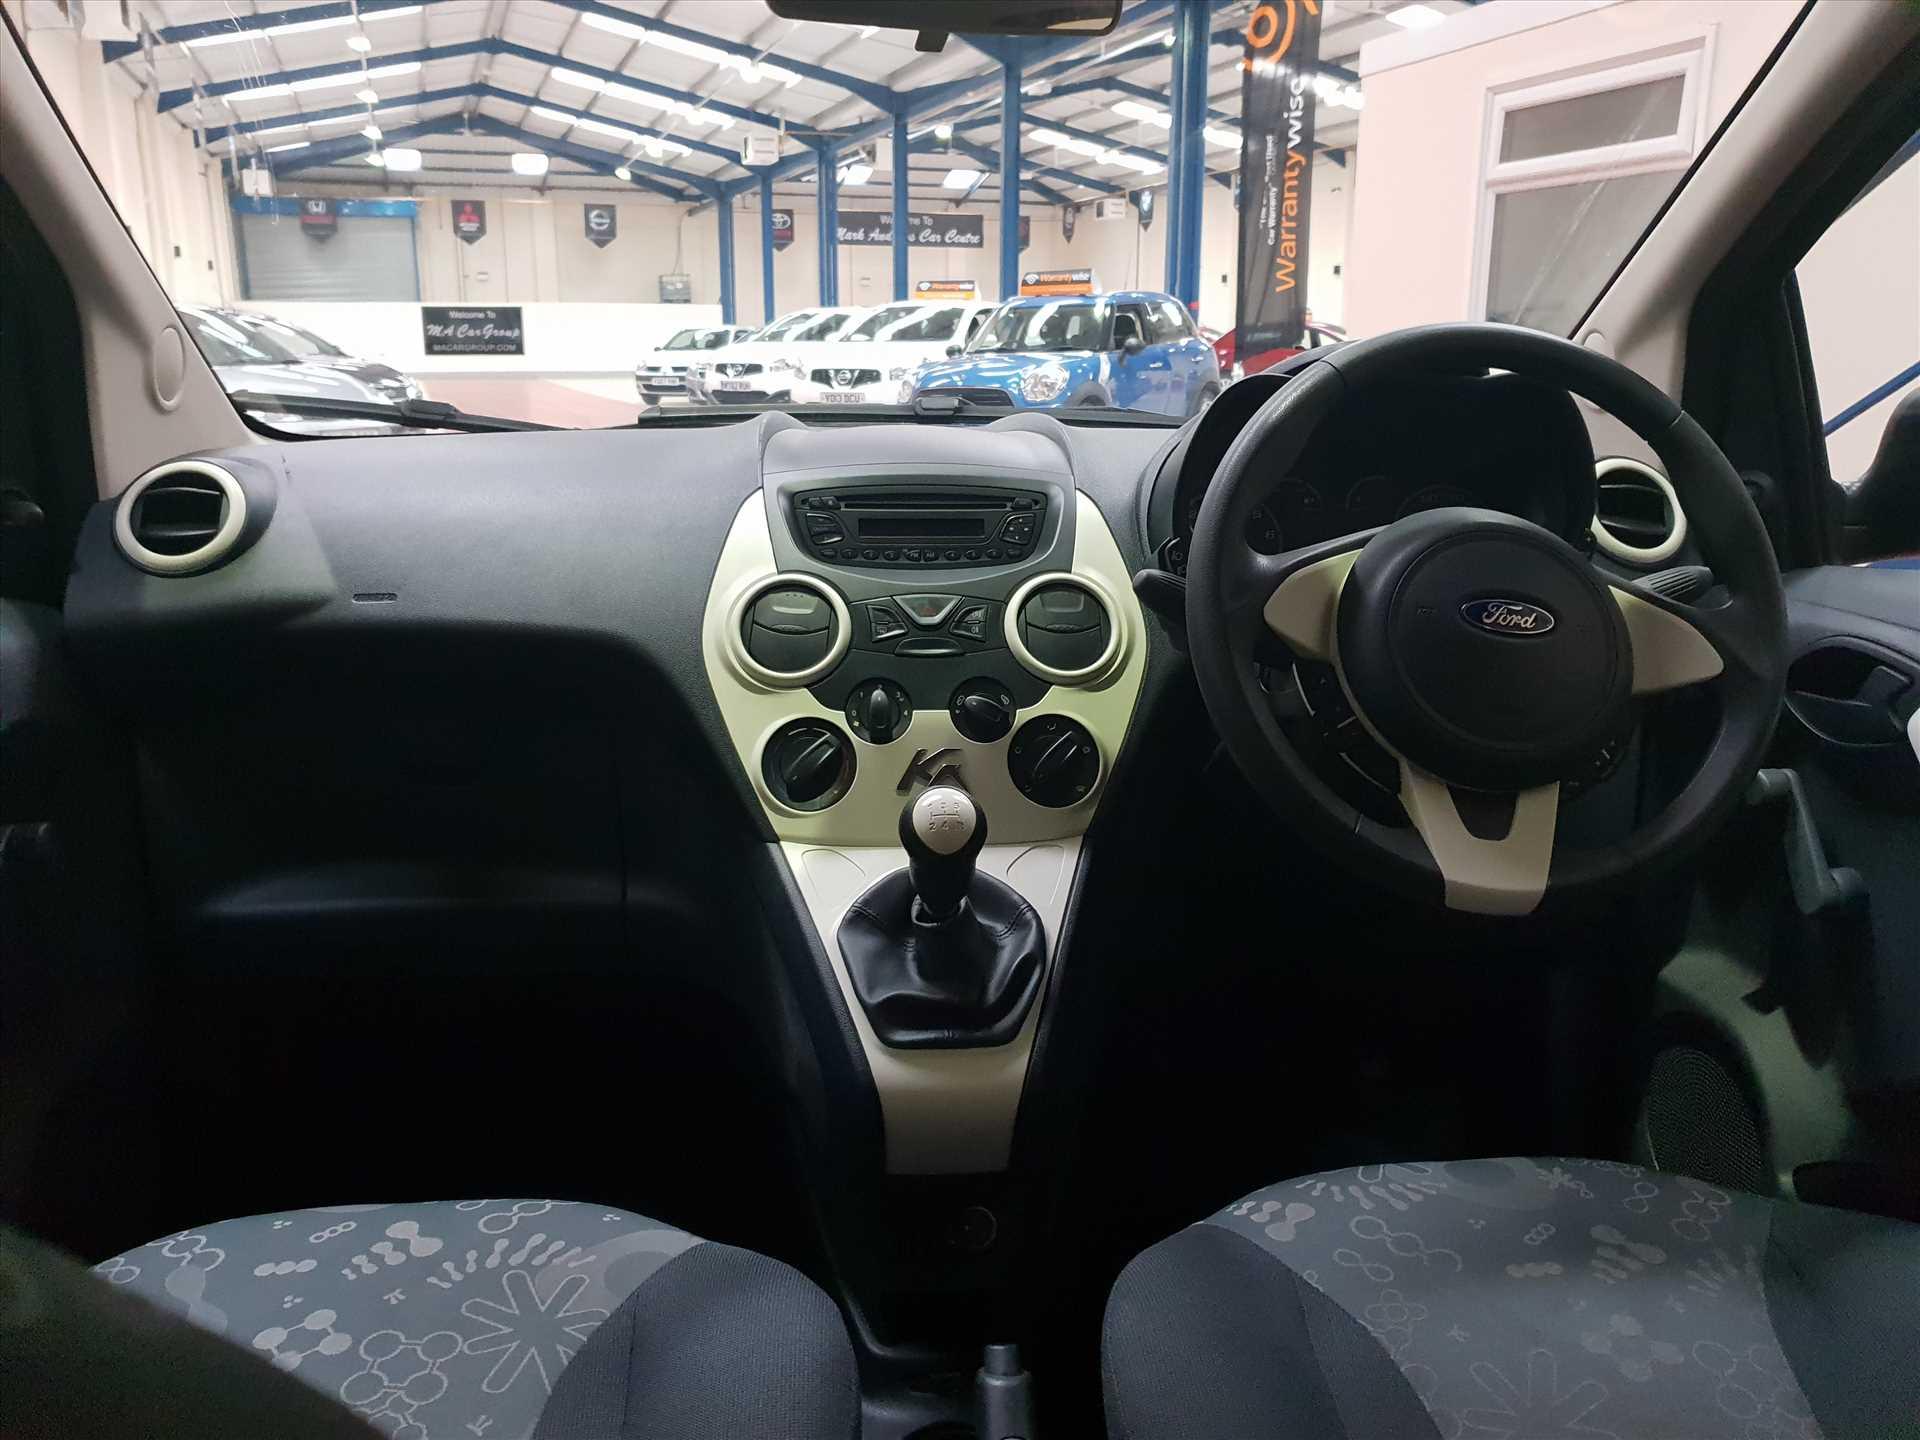 Ford Ka Studio Plus  Ma Car Group Unit  Bloxwich Lane Walsall West Midlands